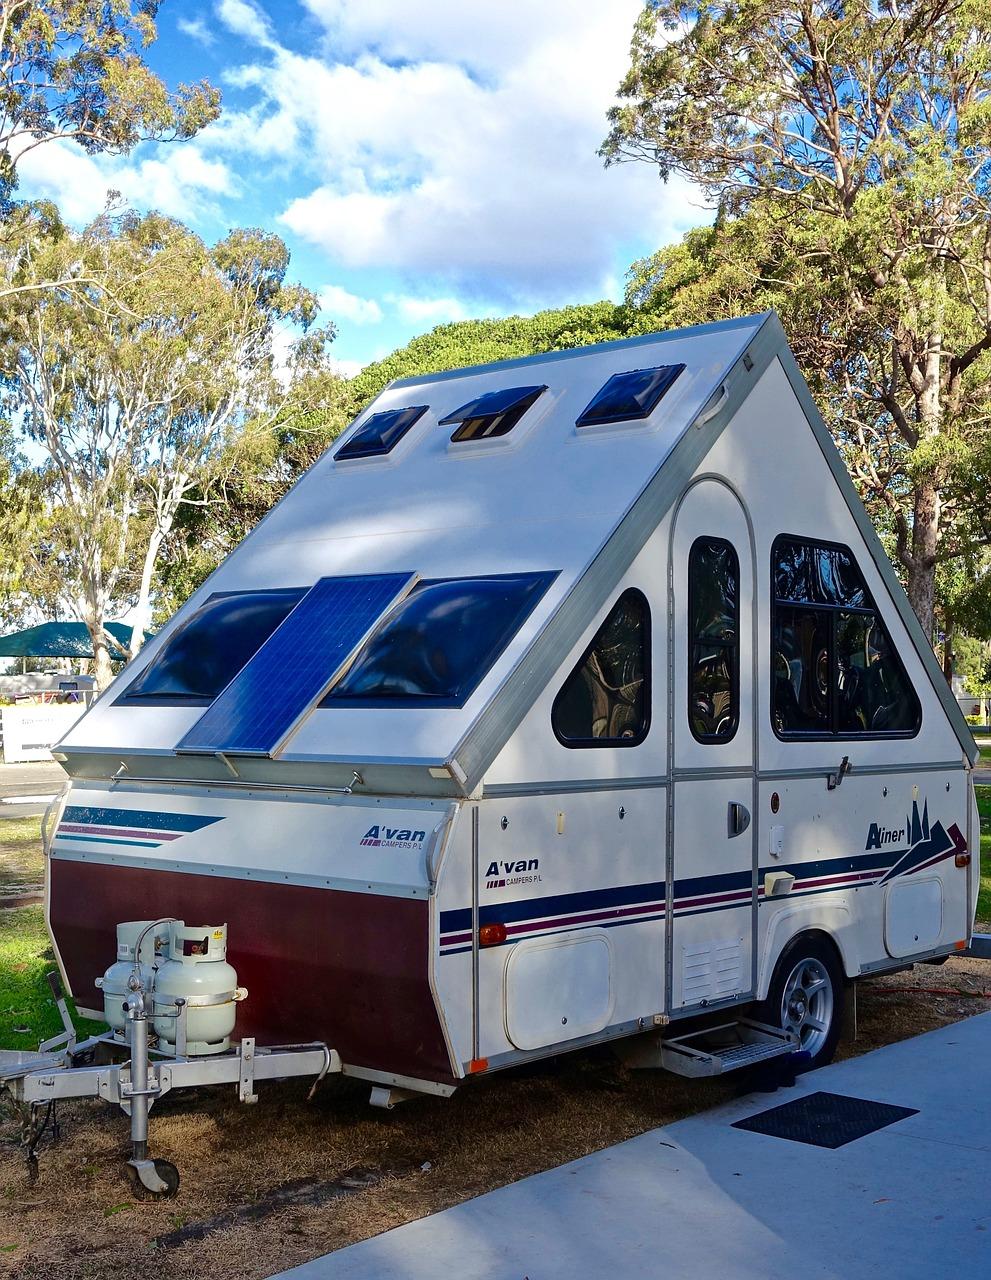 Small Camper: Small Camper Trailer Rentals for Rent